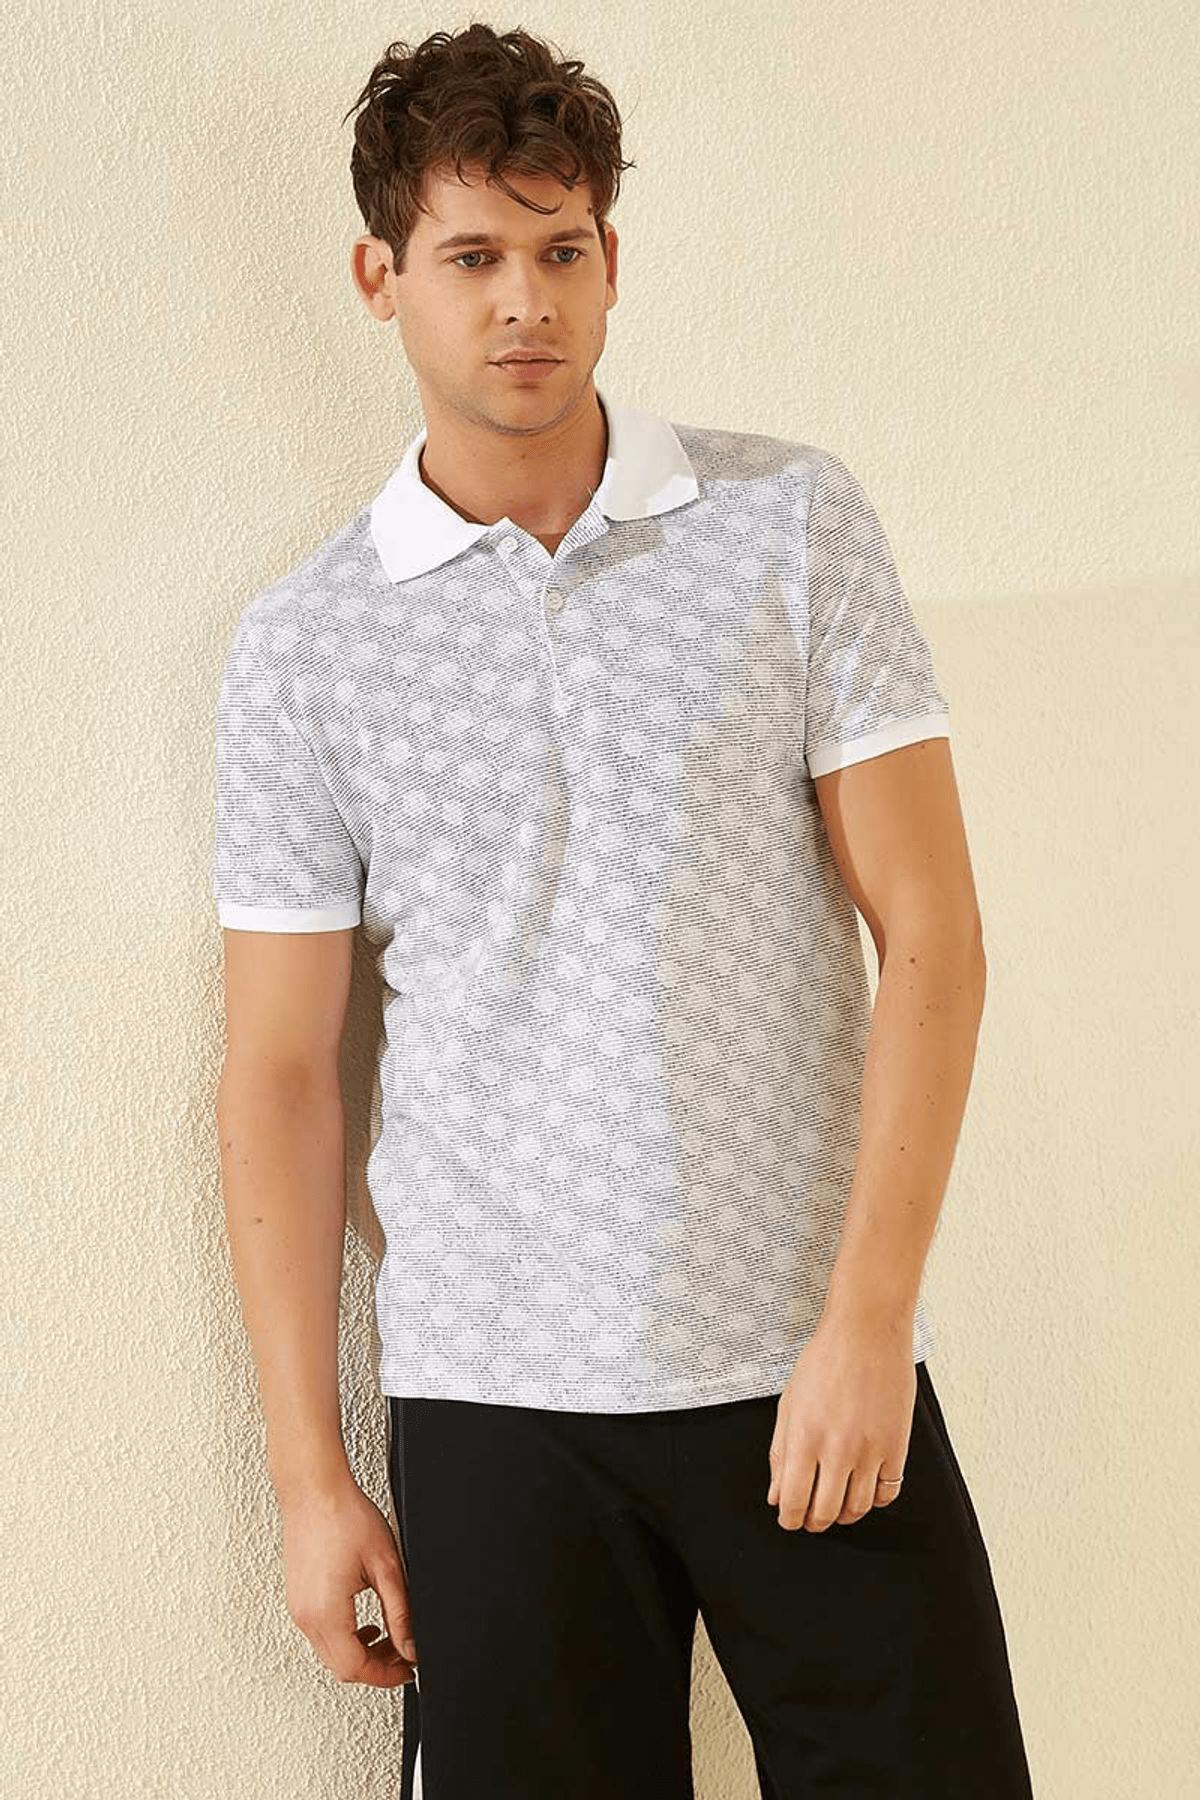 Tommy Life Baskılı Polo Yaka Beyaz Erkek T-Shirt T08ER-87796_1 3